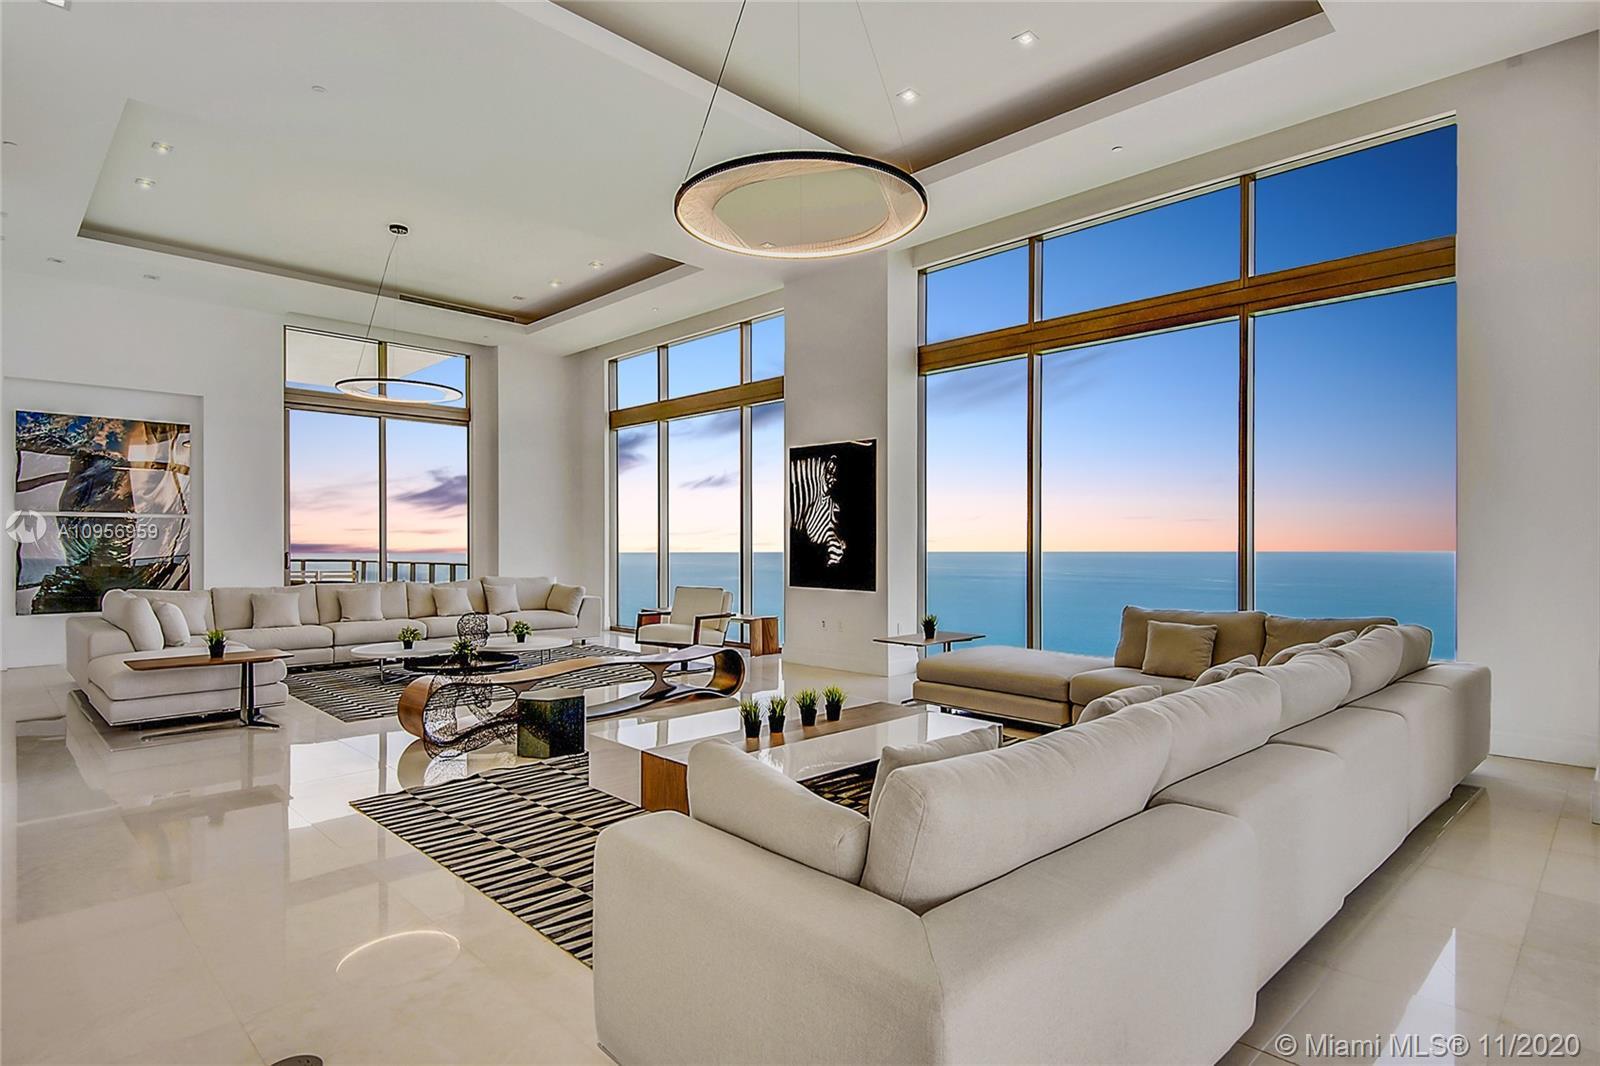 17749 Collins Ave, Unit #PH43 Luxury Real Estate